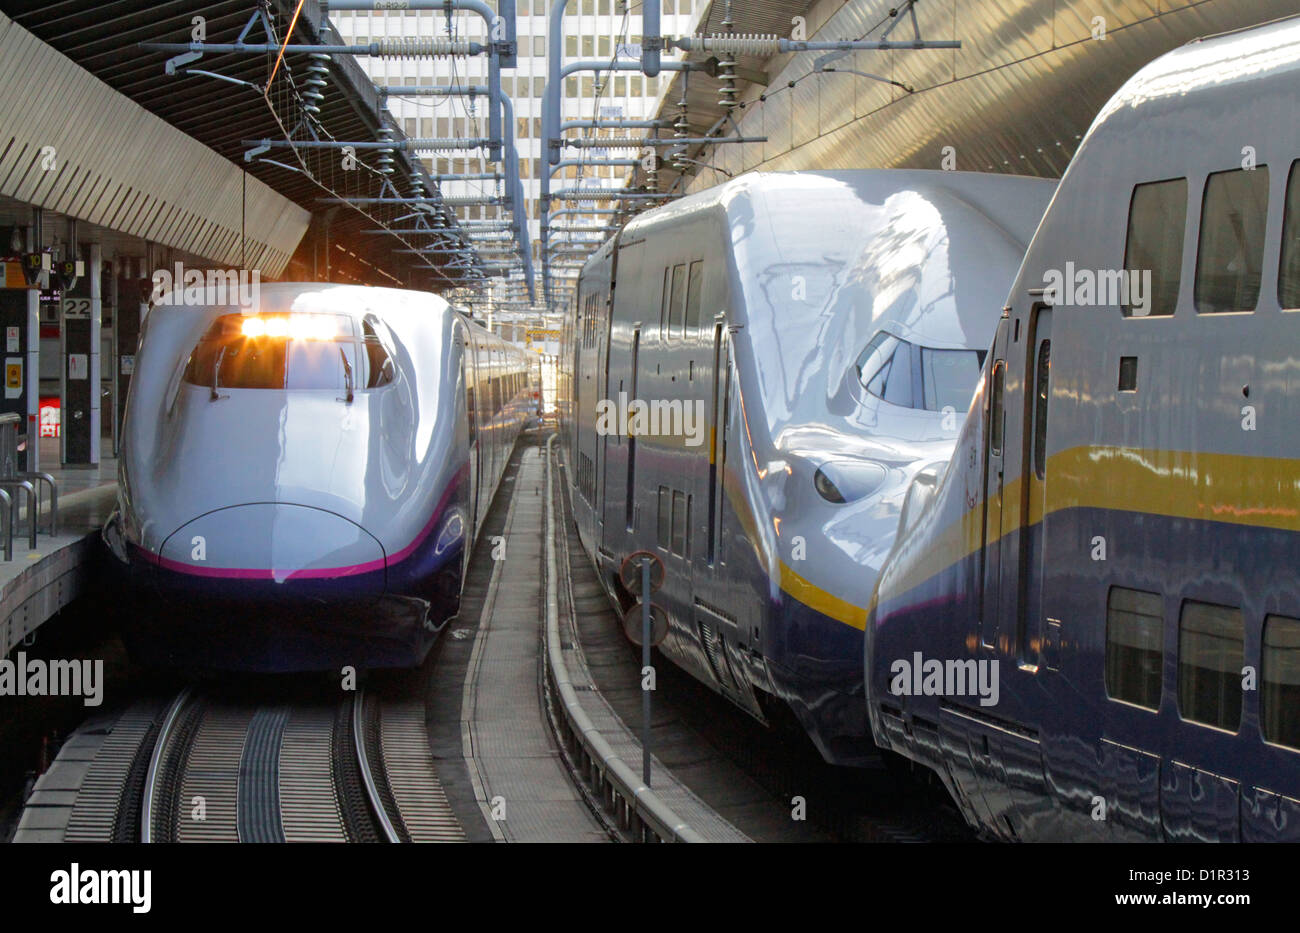 Le Tohoku et Joetsu Shinkansen à la gare de Tokyo Japon Photo Stock